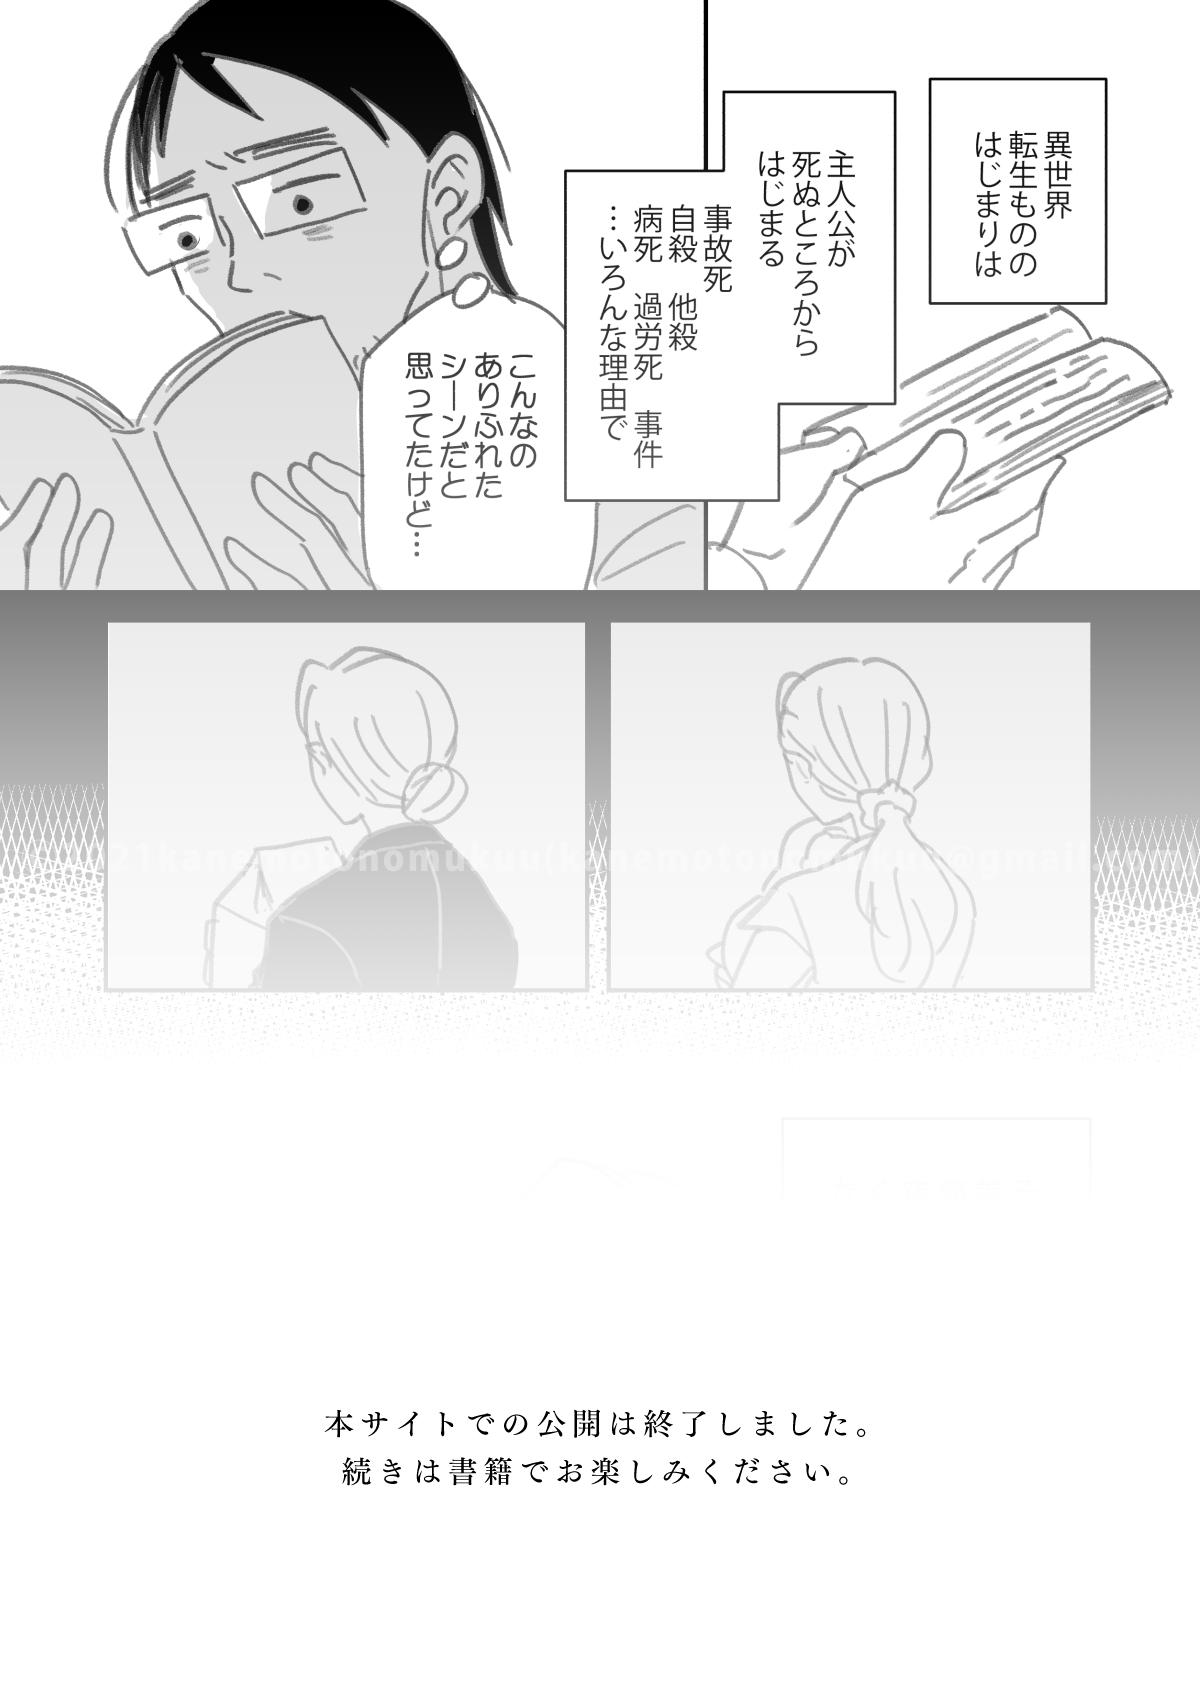 f:id:kanemotonomukuu:20211023143025j:plain